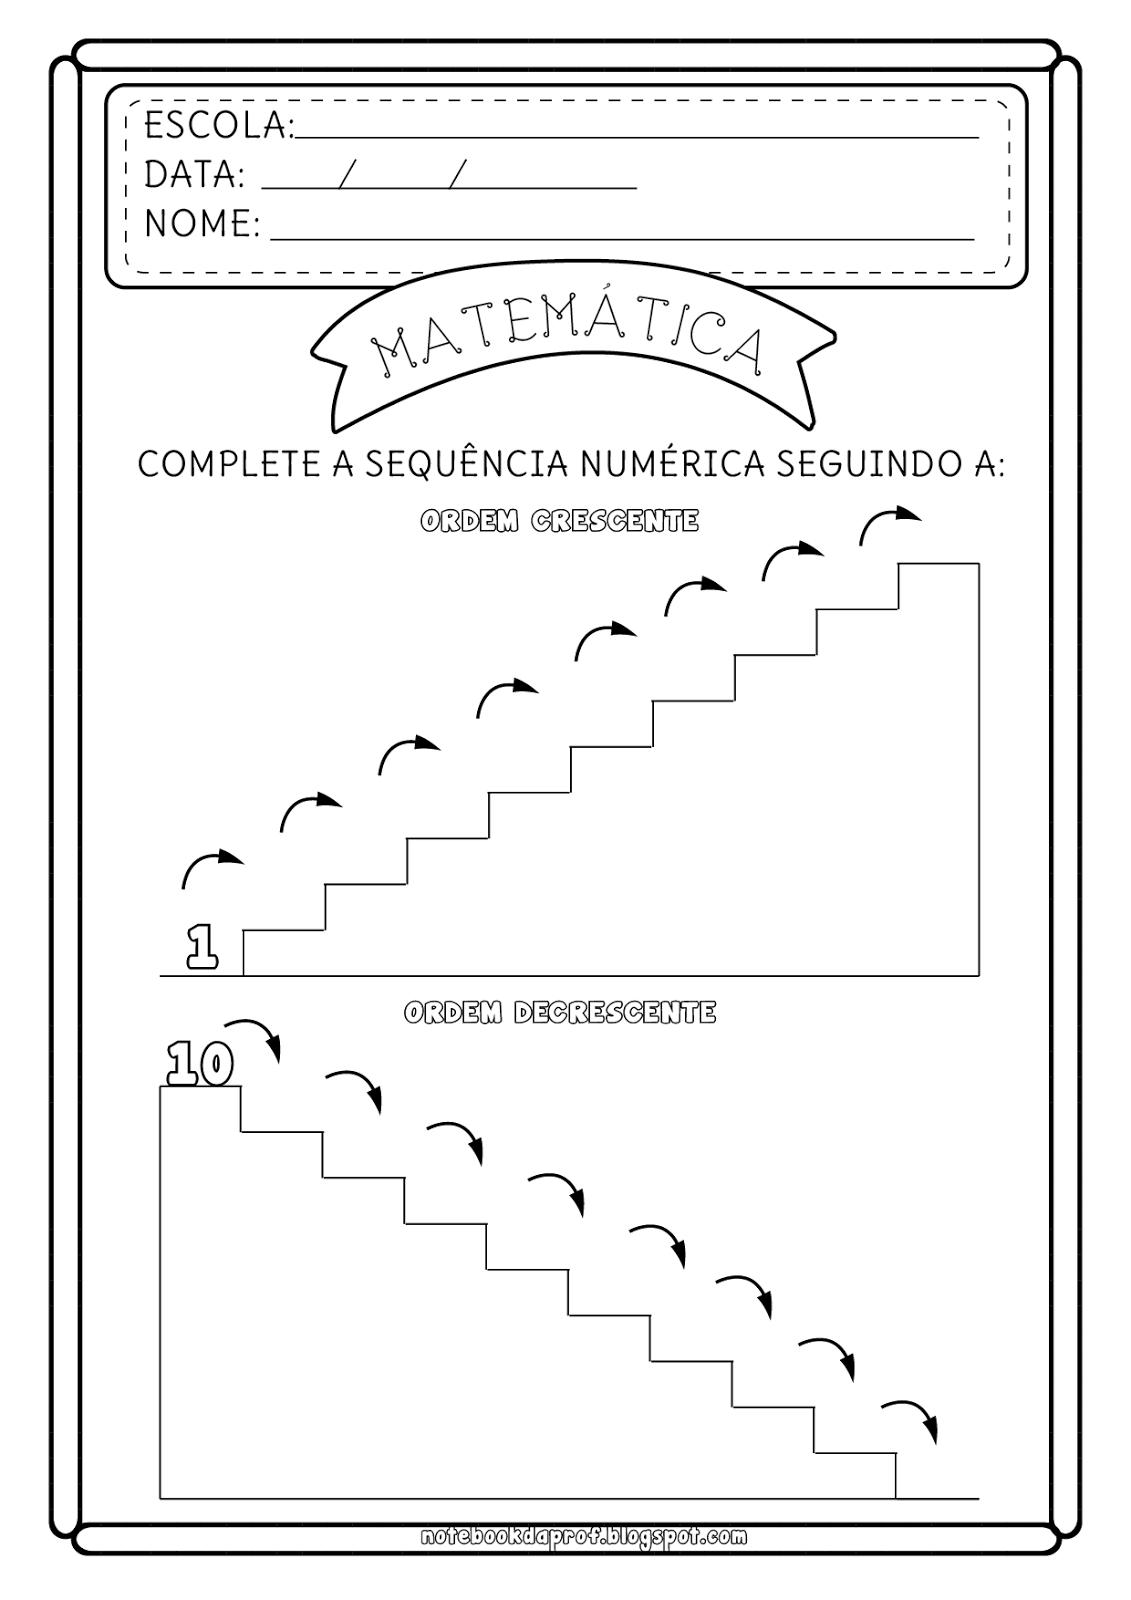 Atividade Ordem Crescente e decrescente | Mathe, Zahlen und Schule